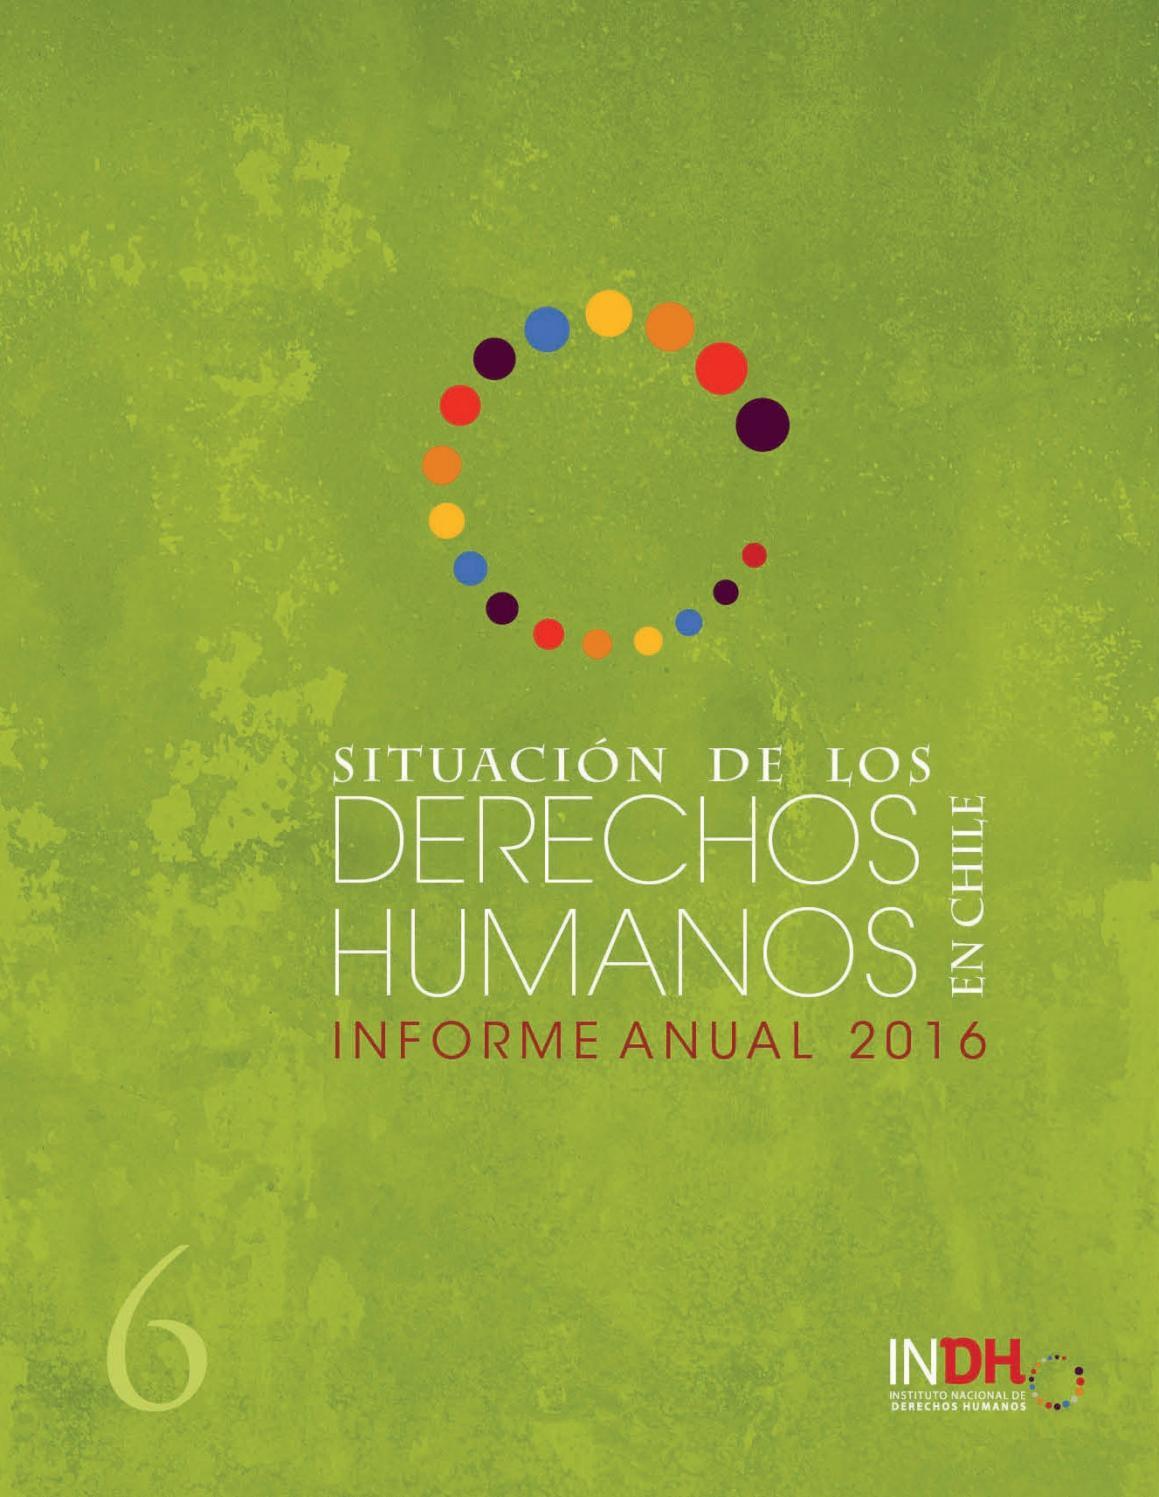 Informe anual indh 2016 by Instituto Nacional Derechos Humanos - issuu